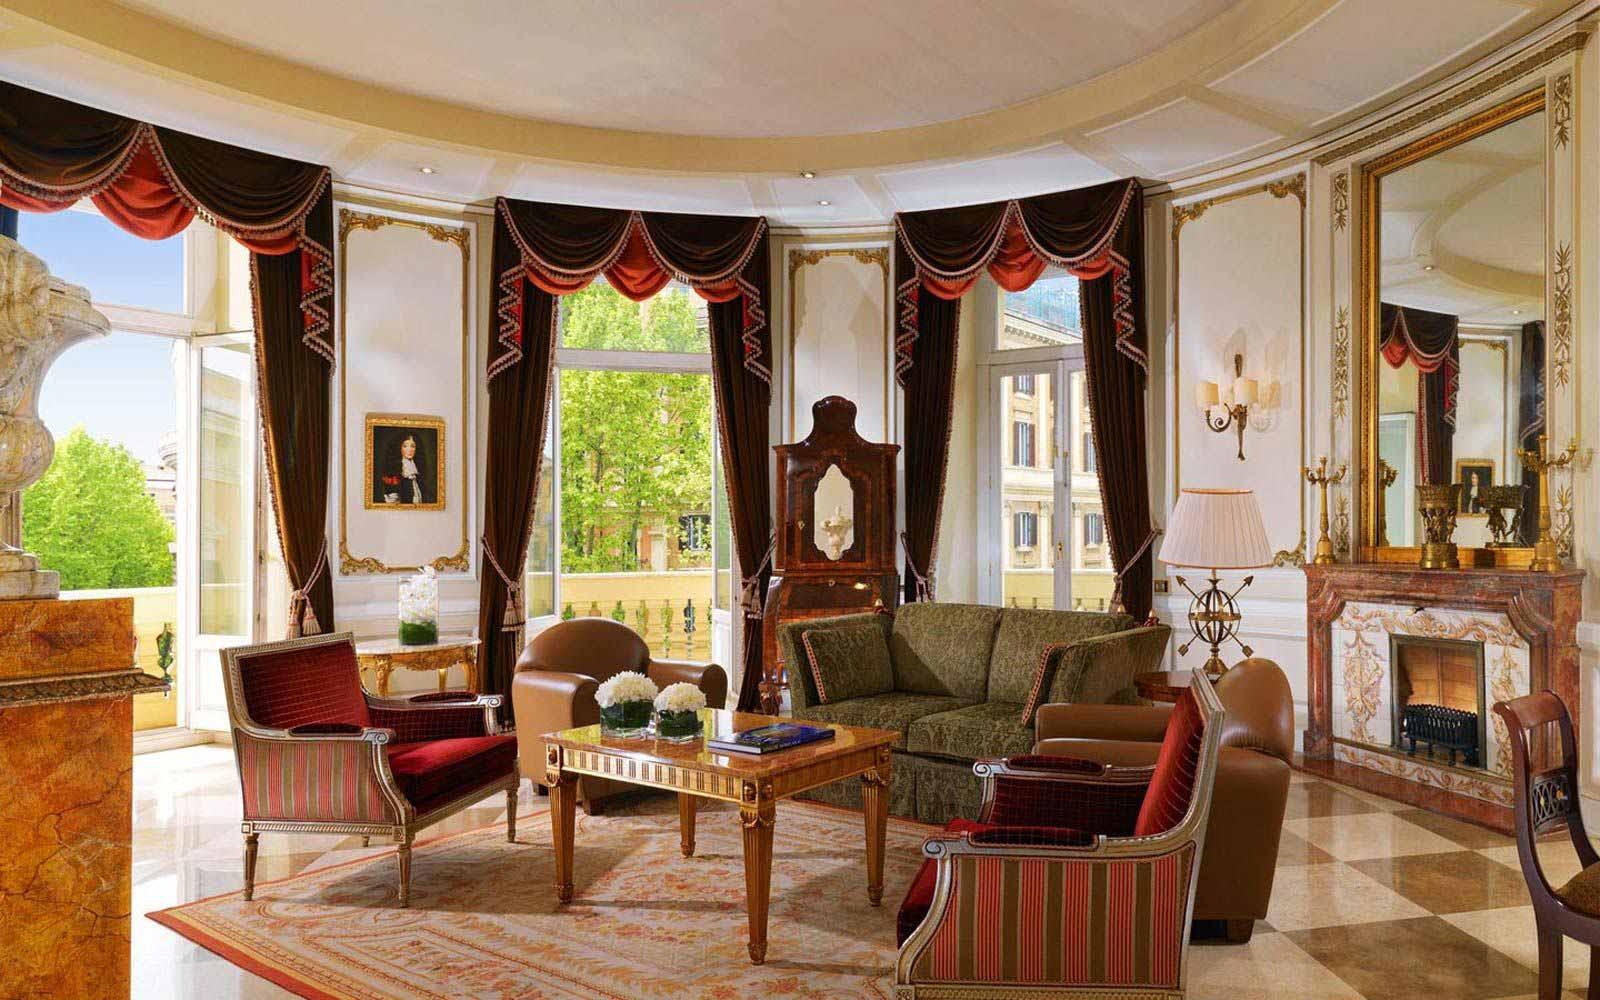 Via Veneto suite at The Westin Excelsior